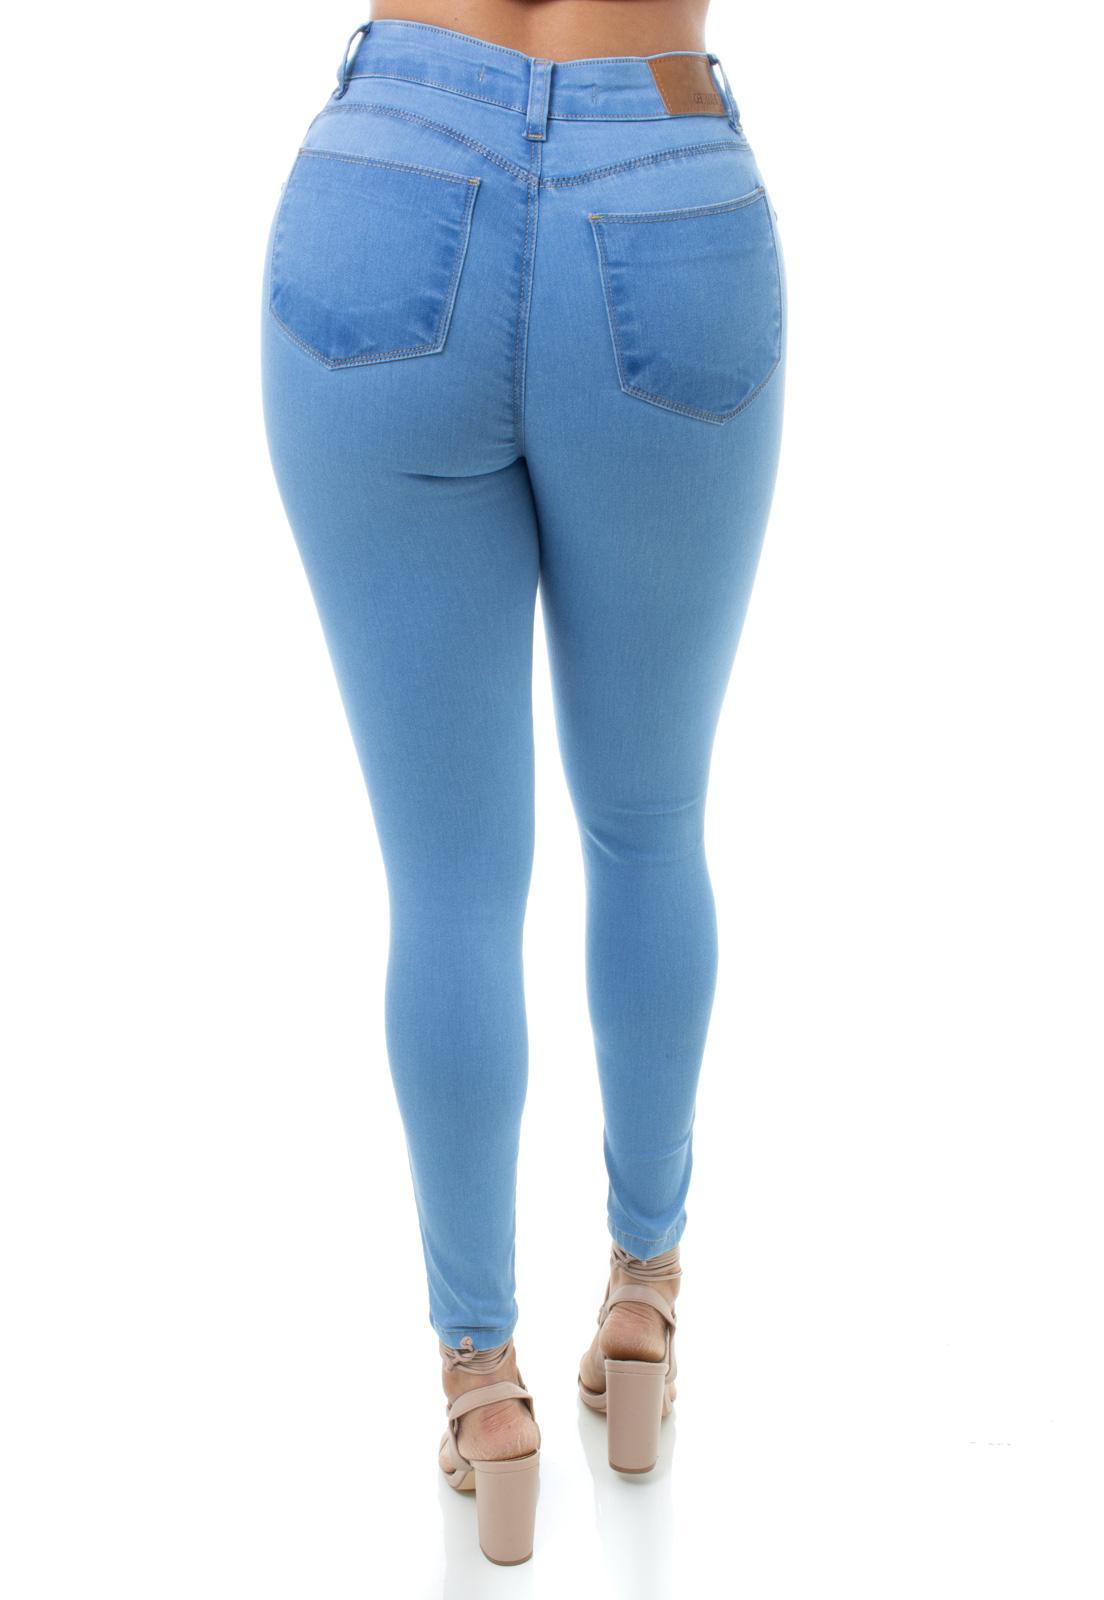 Cigarrete  Jeans Feminina Crocker - 48224  - CROCKER JEANS